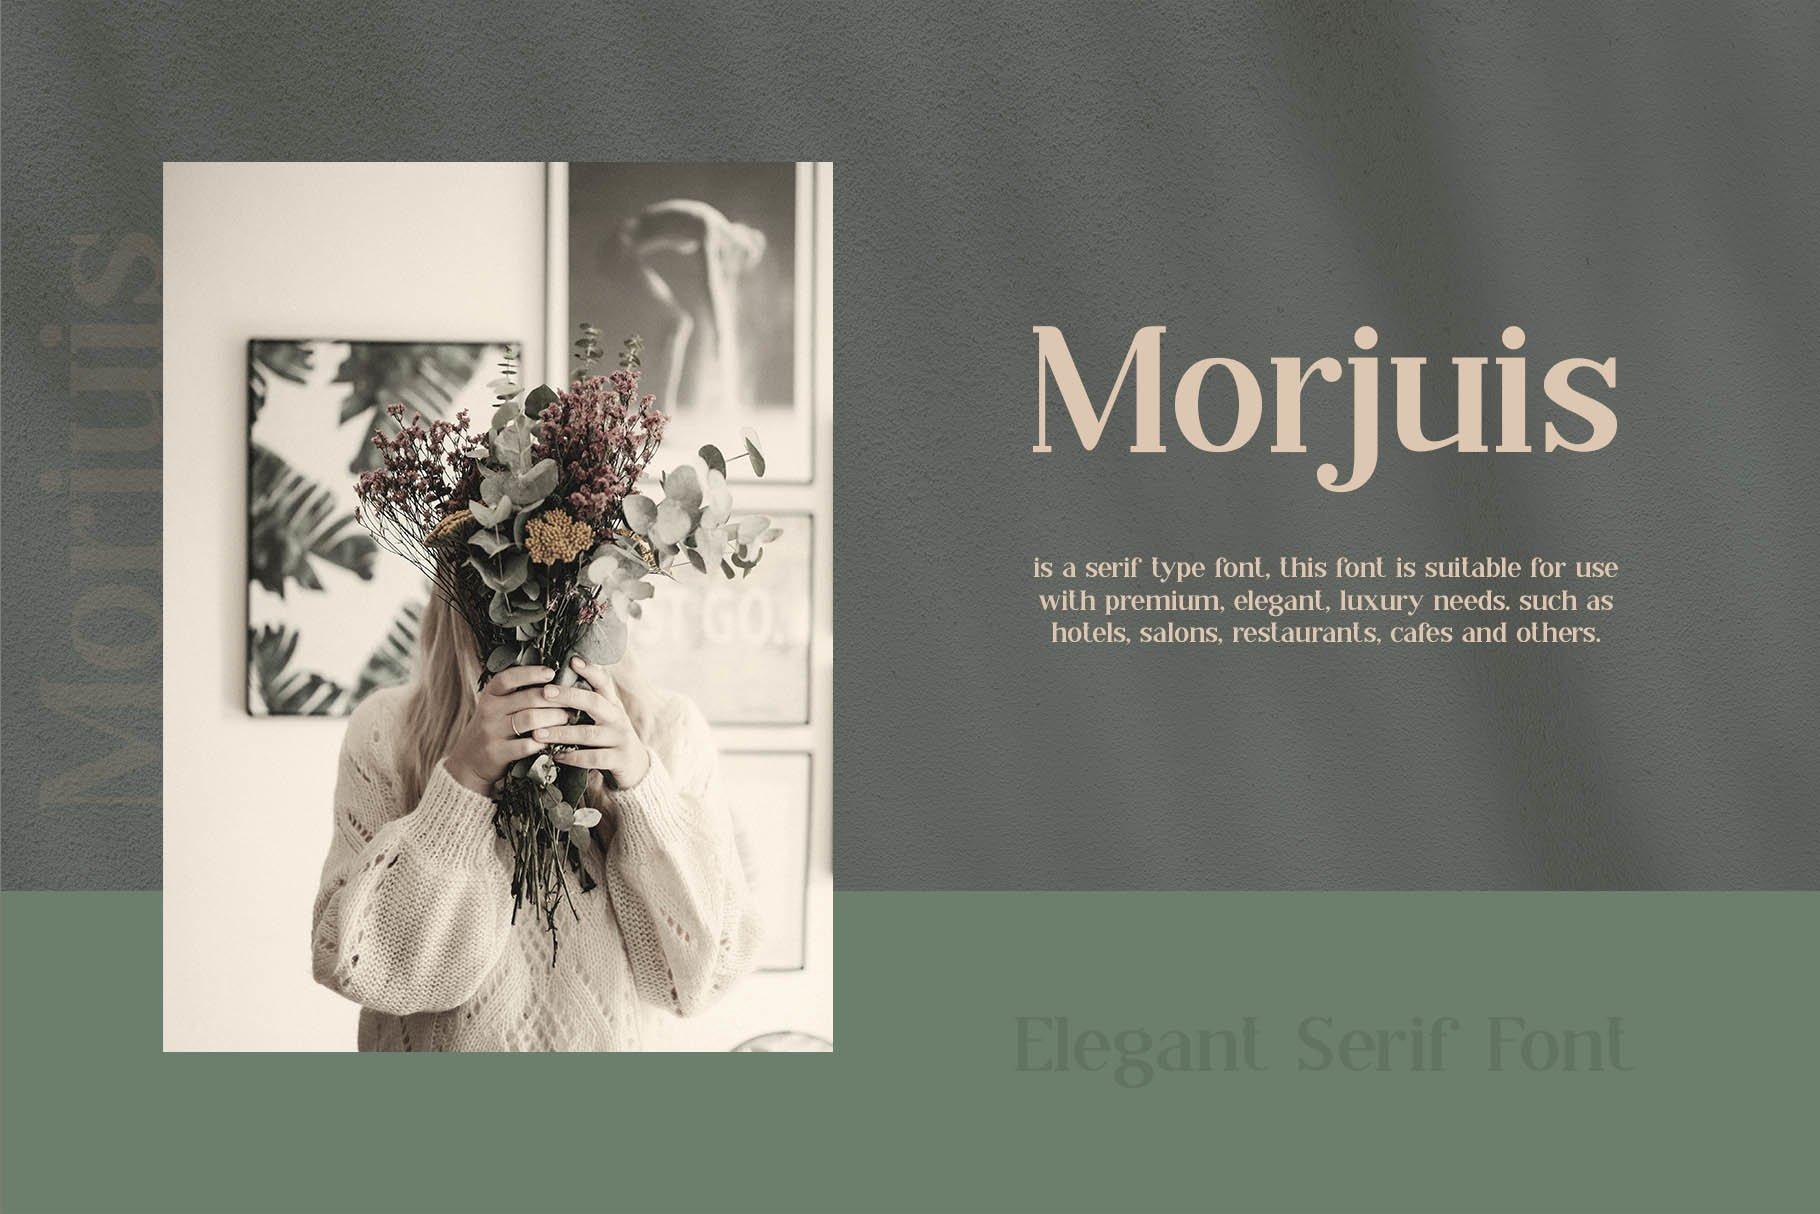 MORJUIS - Serif Font Typeface example image 6